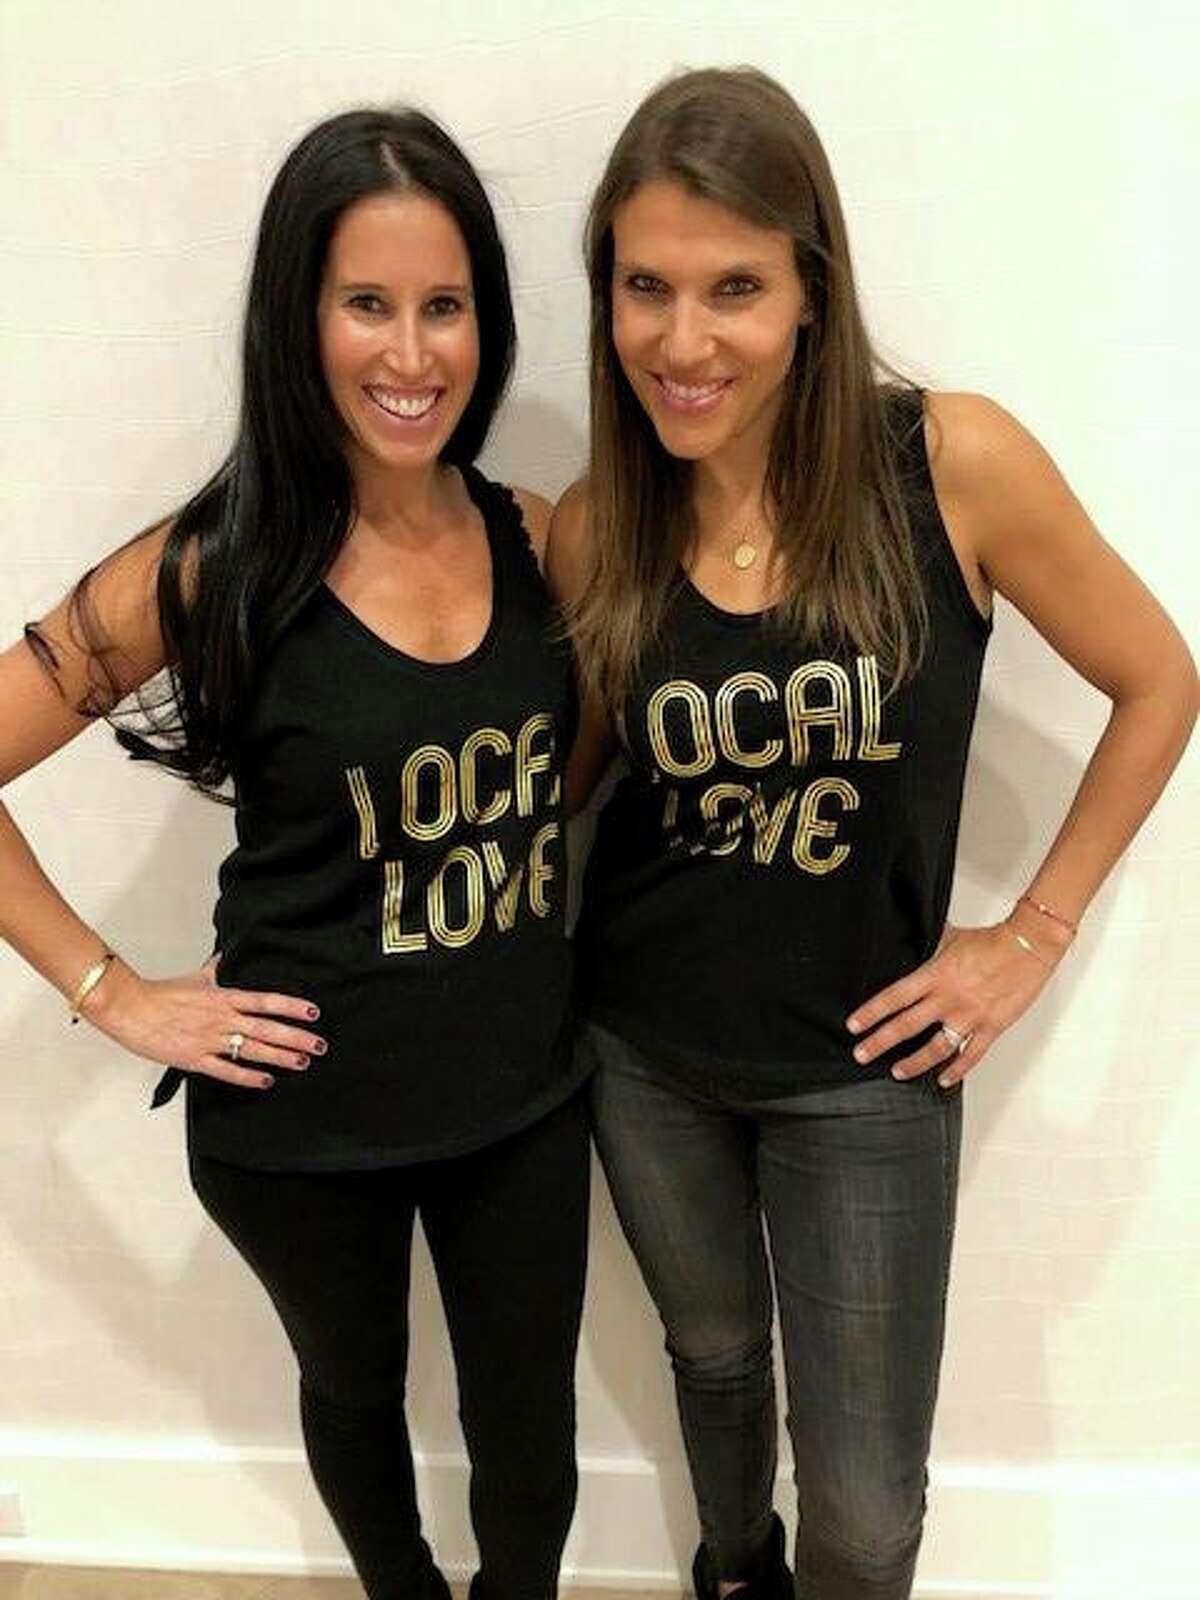 Westportmoms co-founders Megan Rutstein and Melissa Post showing